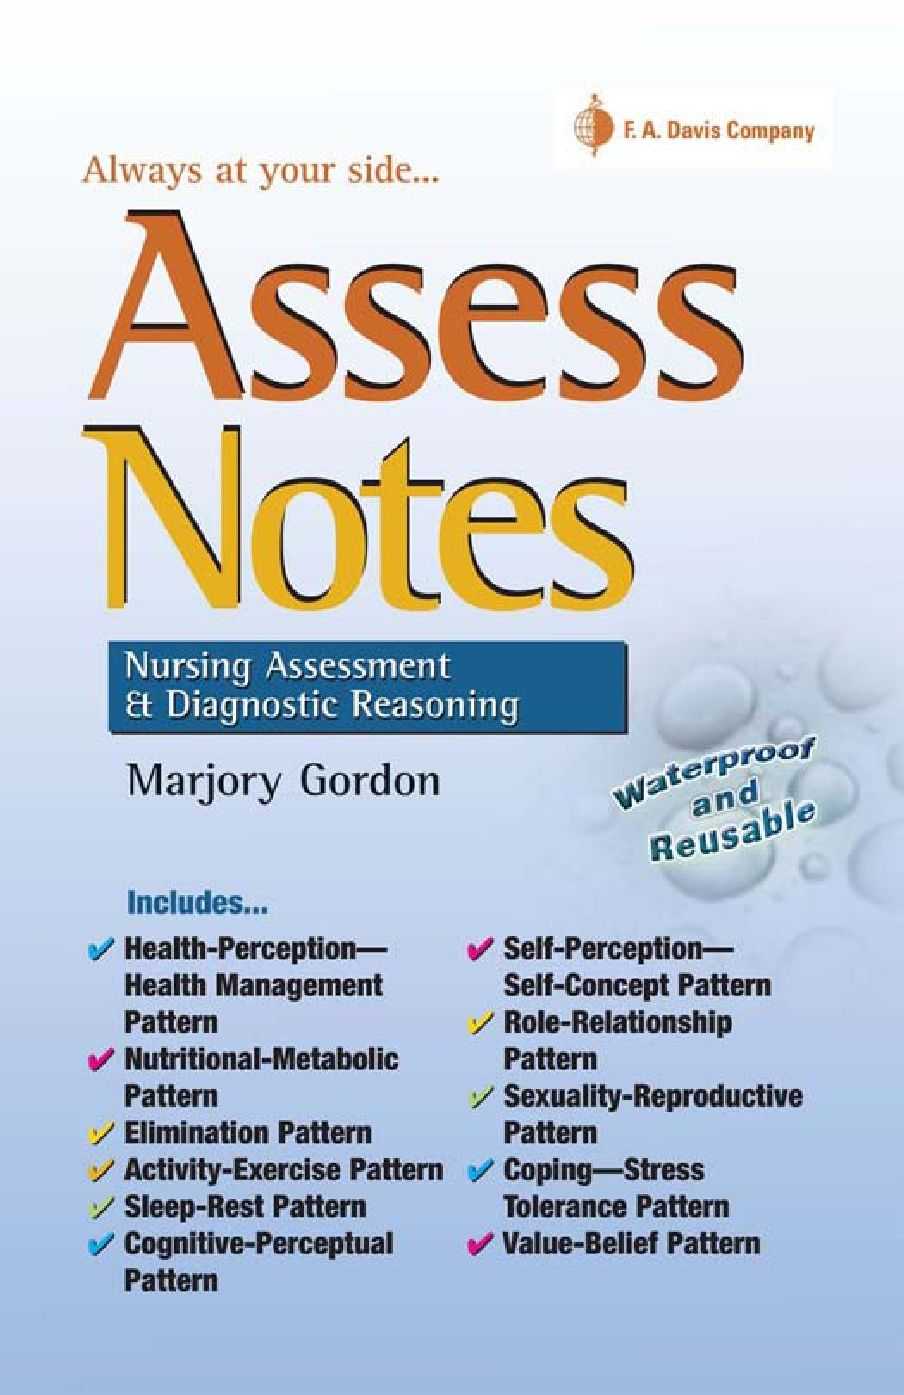 Assess Notes Nursing Assessment & Diagnostic Reasoning